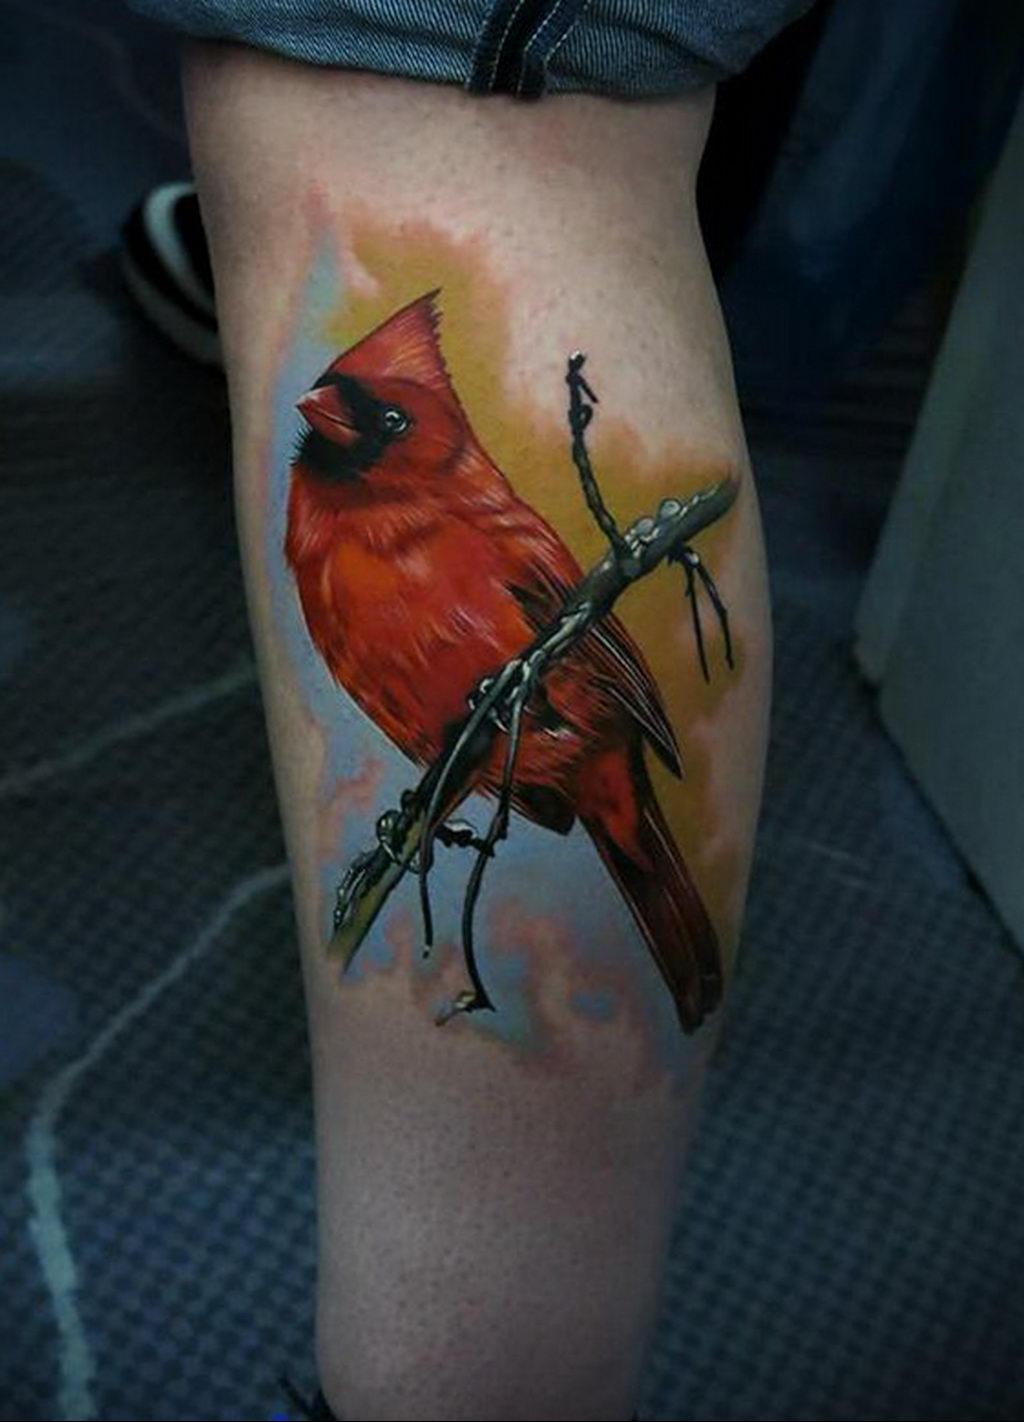 Фото тату про любовь рисунок Птица 03.02.2020 №207 -bird tattoo- tatufoto.com